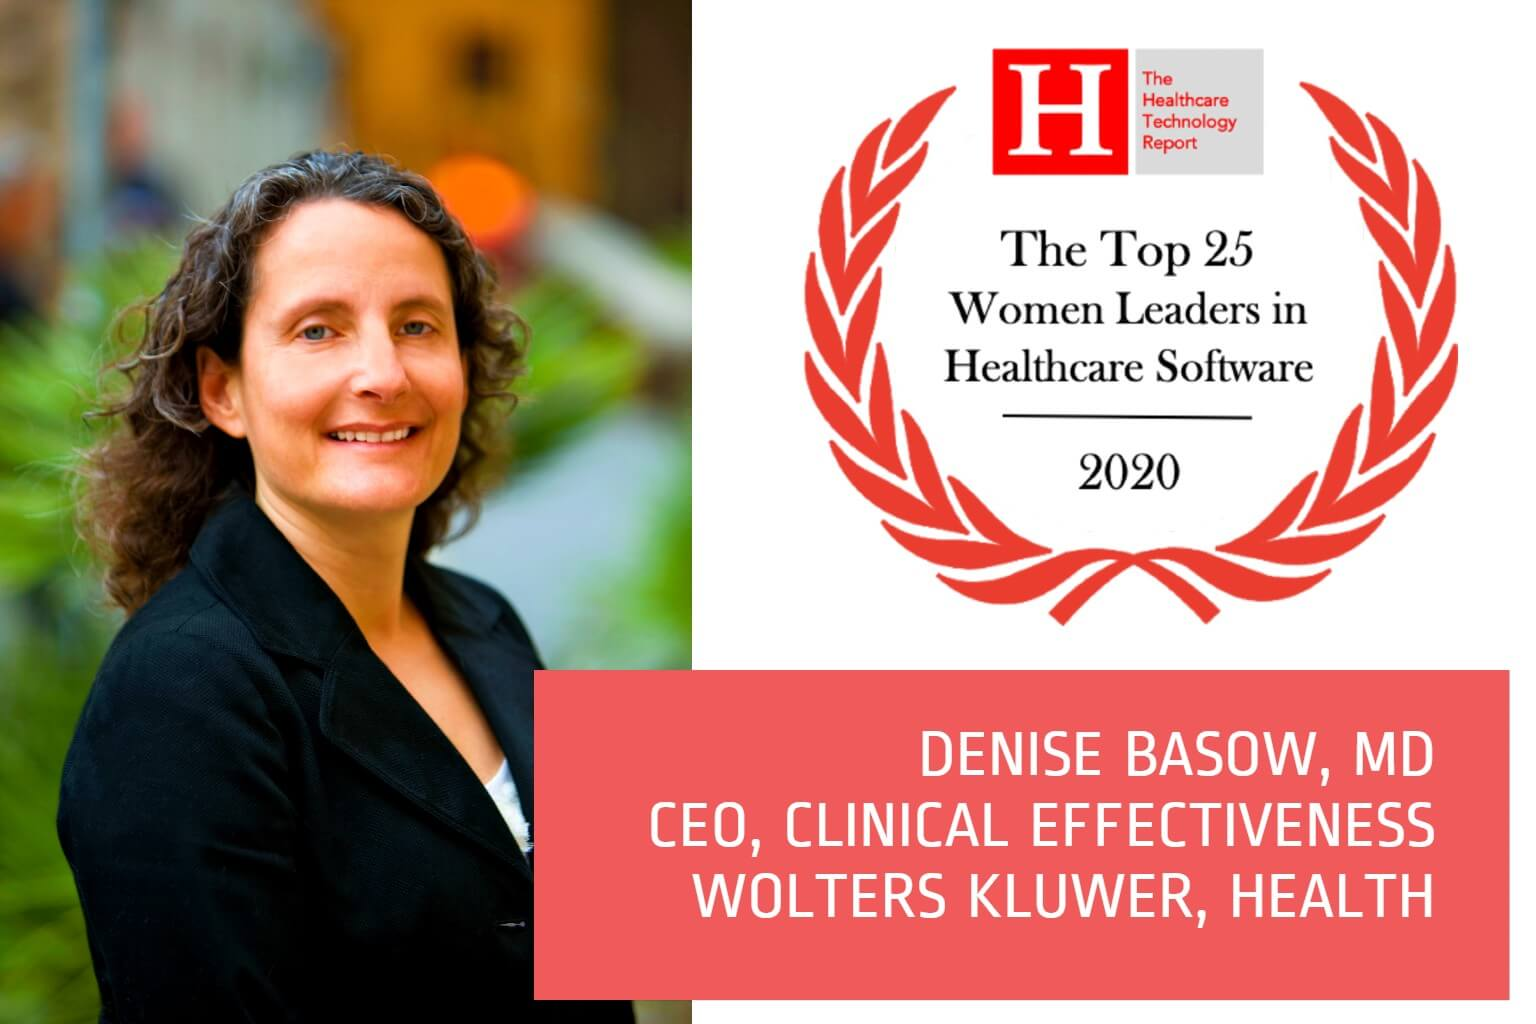 Denise Basow, MD - Women Leaders in Healthcare Software 2020